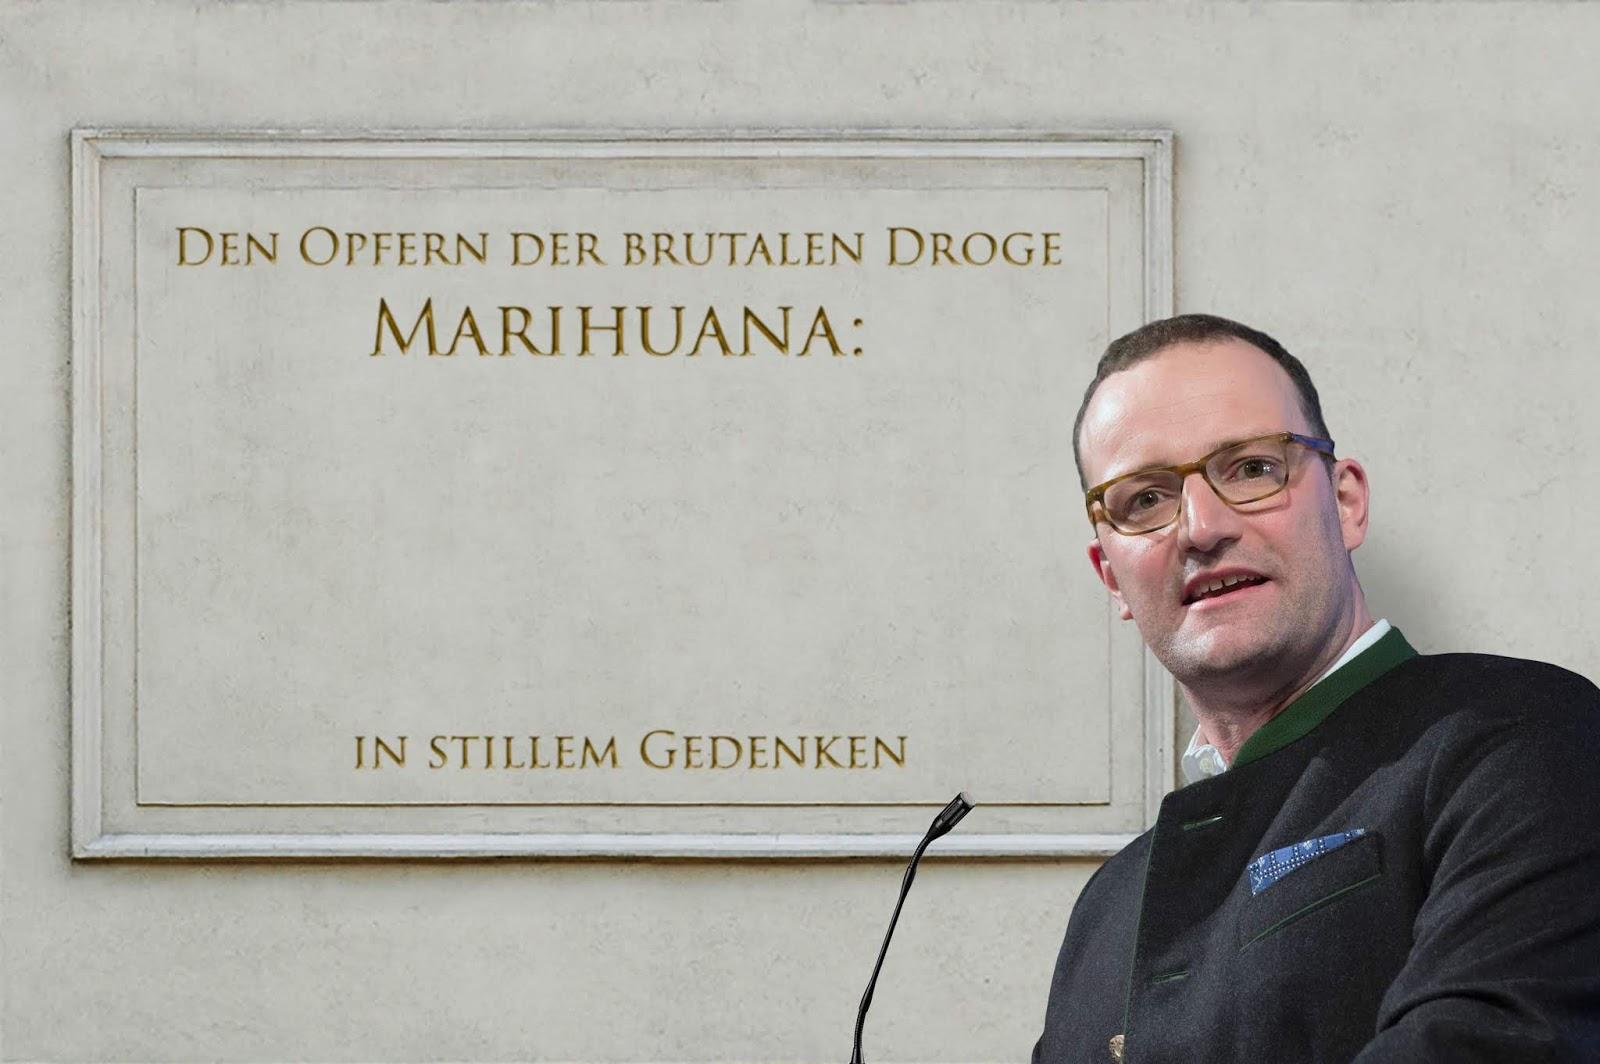 [Obrazek: Marihuana_Opfer.jpg]